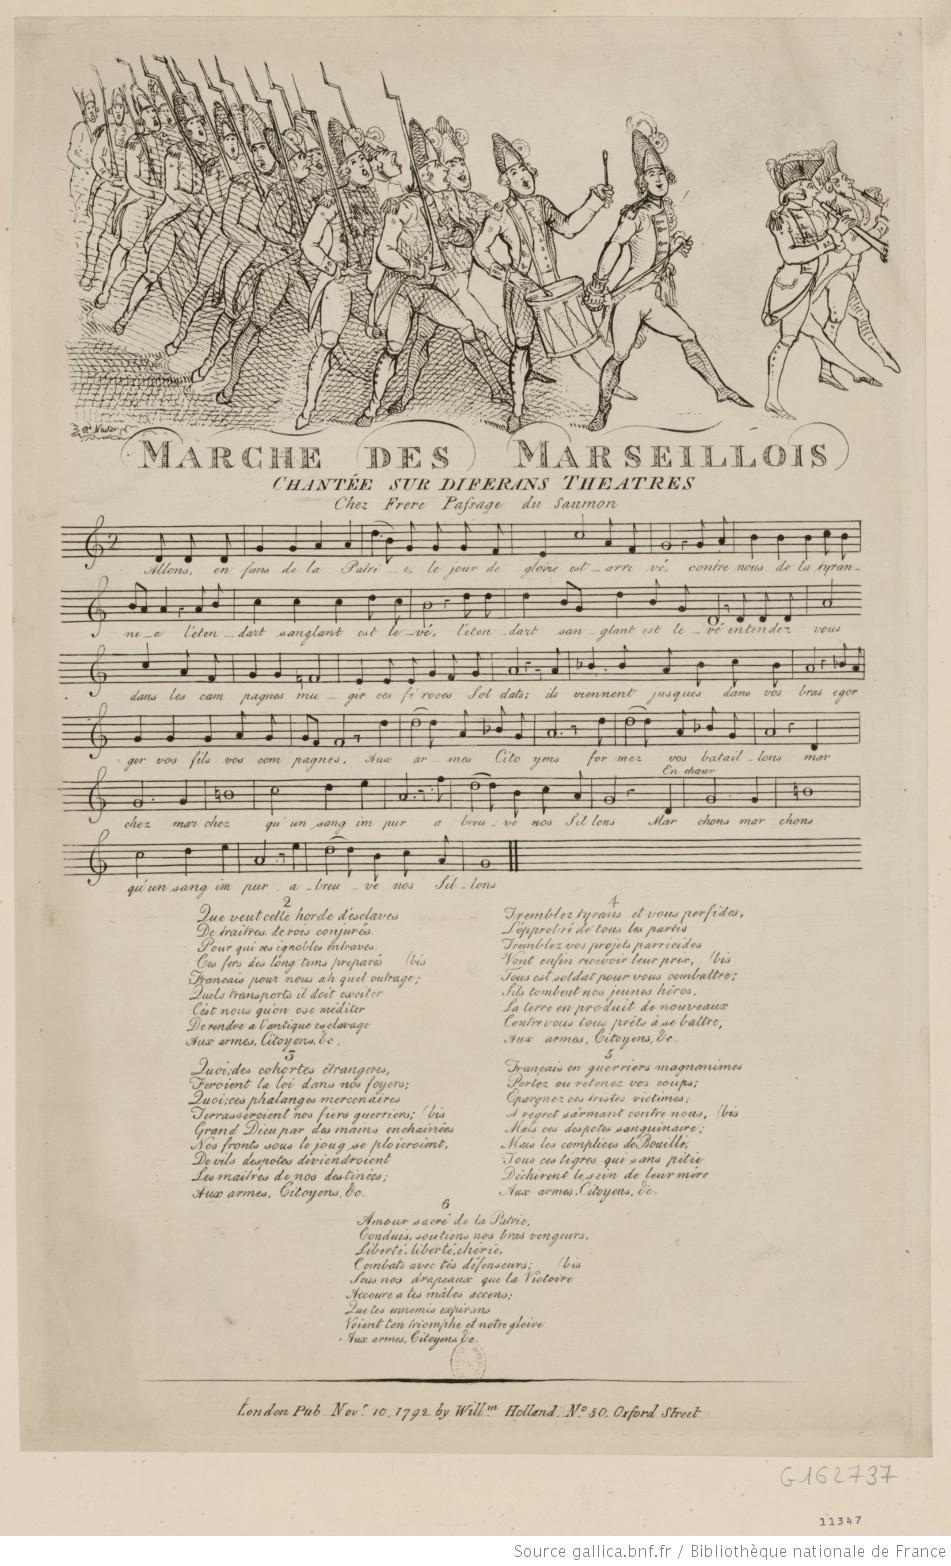 La Marche des Marseillois, 1792